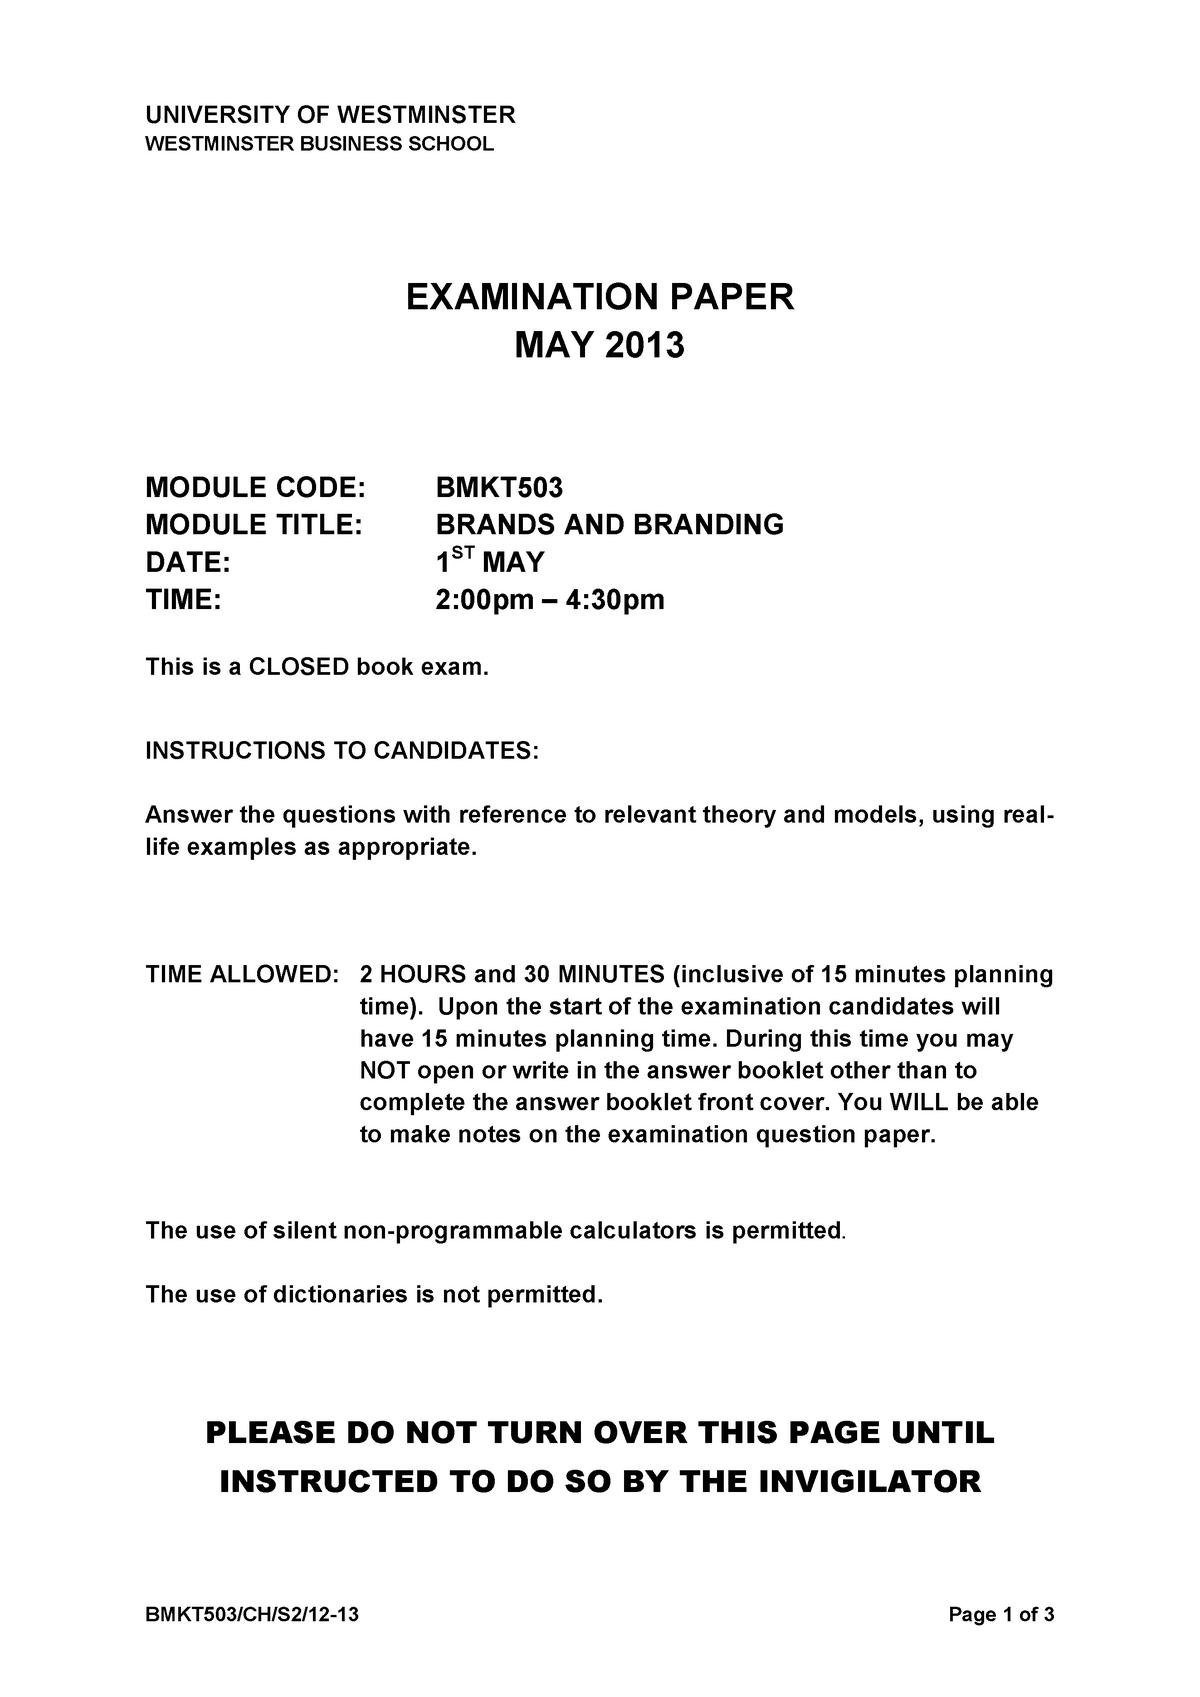 f598b3ecba Exam 2013 - BMKT503: Brands and Branding - StuDocu